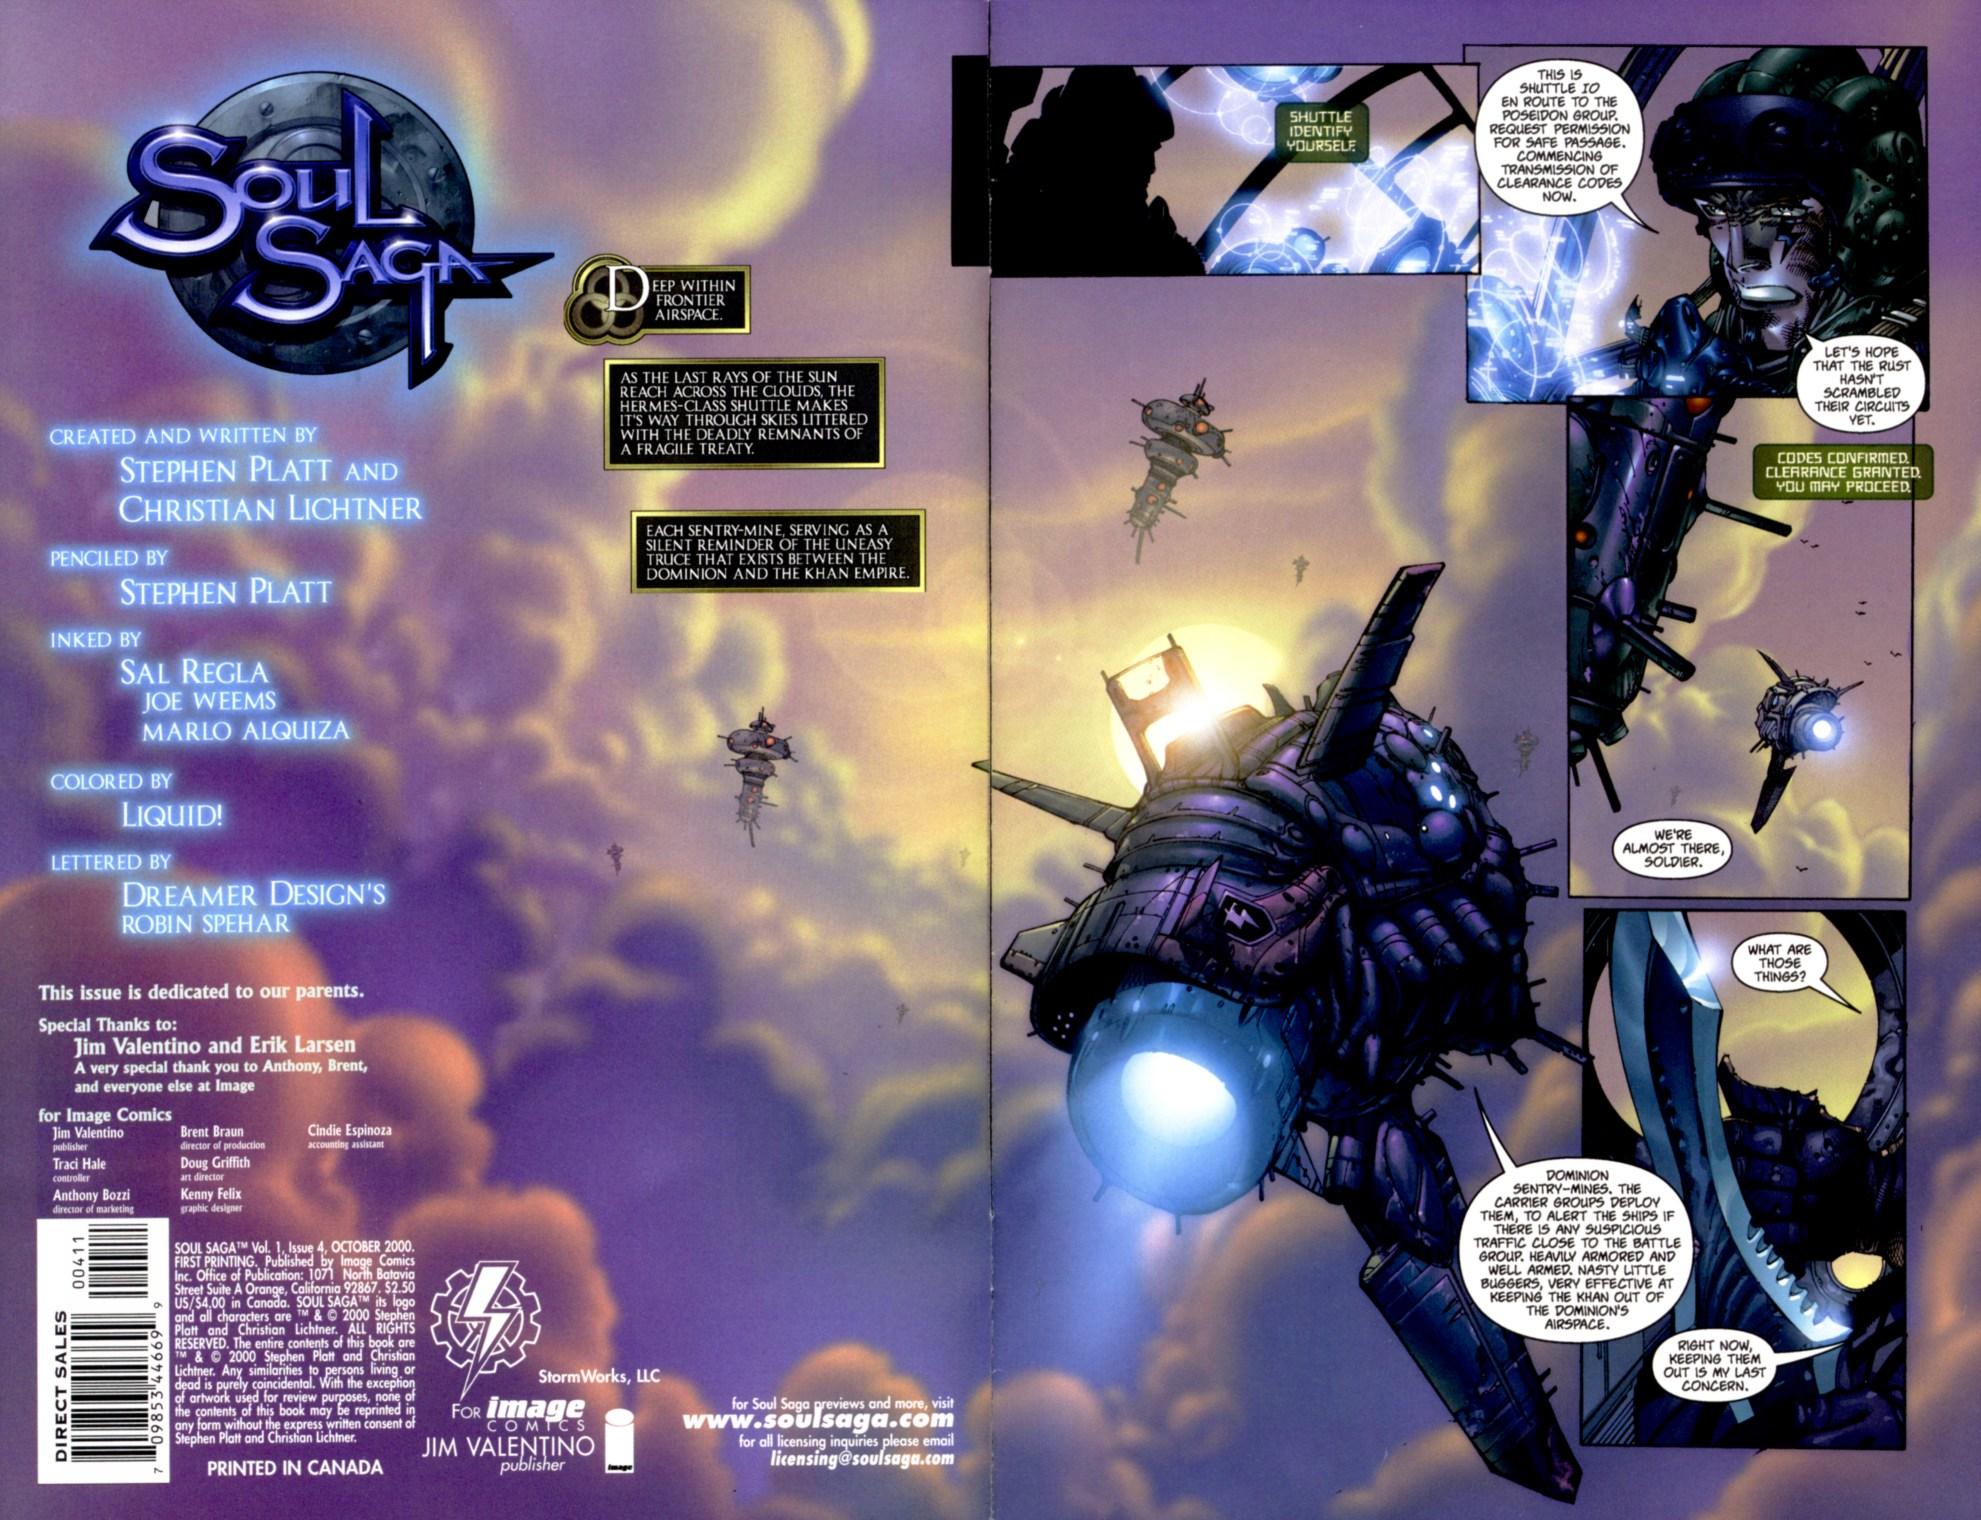 Read online Soul Saga comic -  Issue #4 - 2